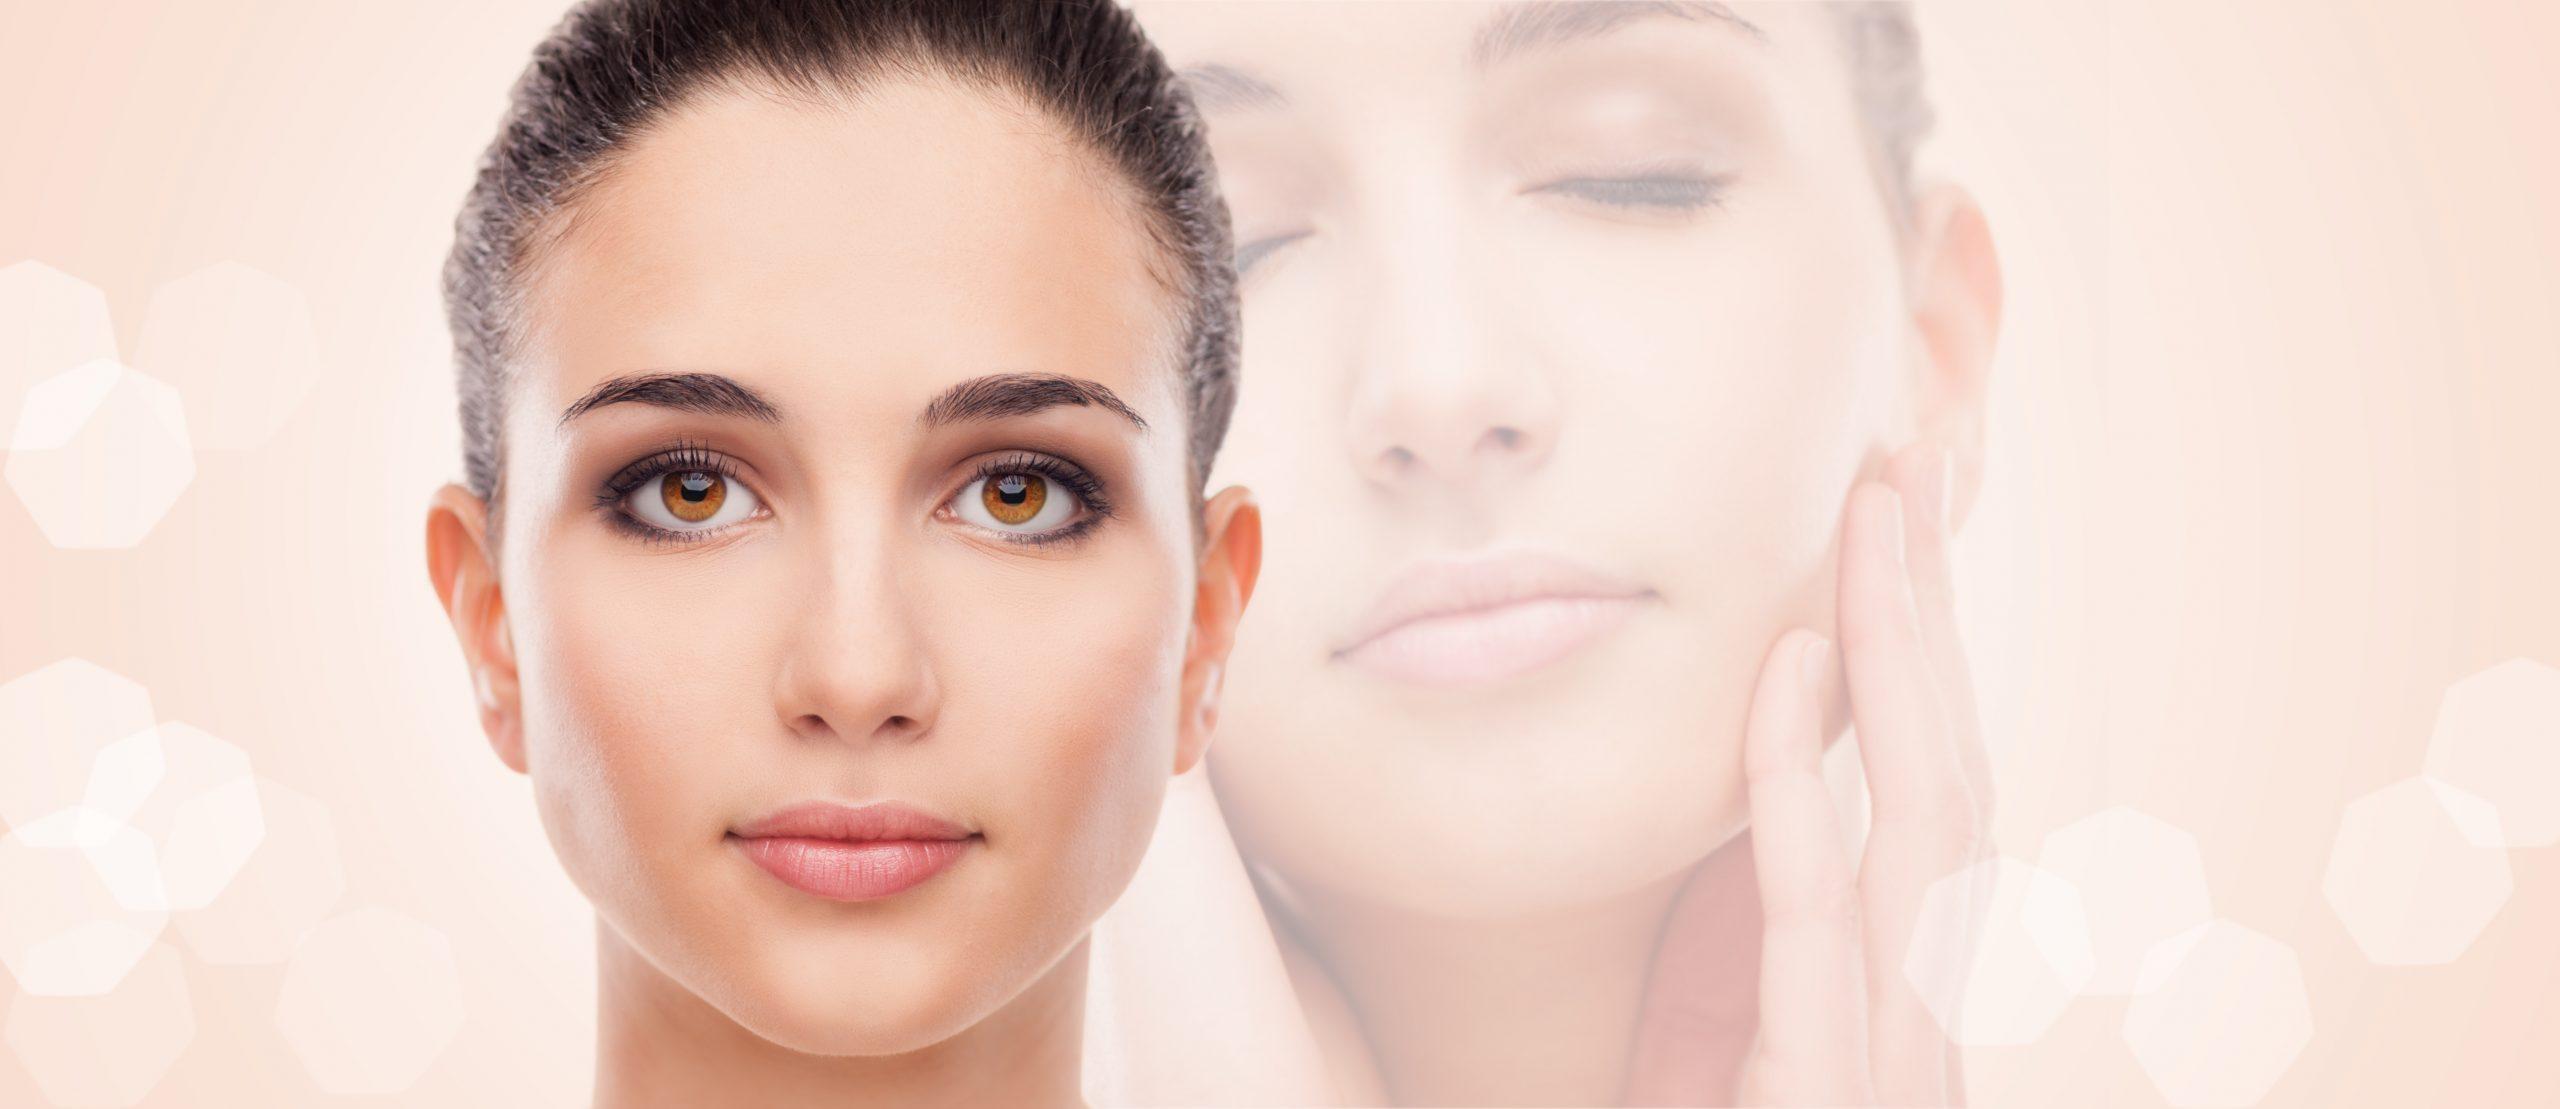 anti wrinkle treatment with Botox toxin